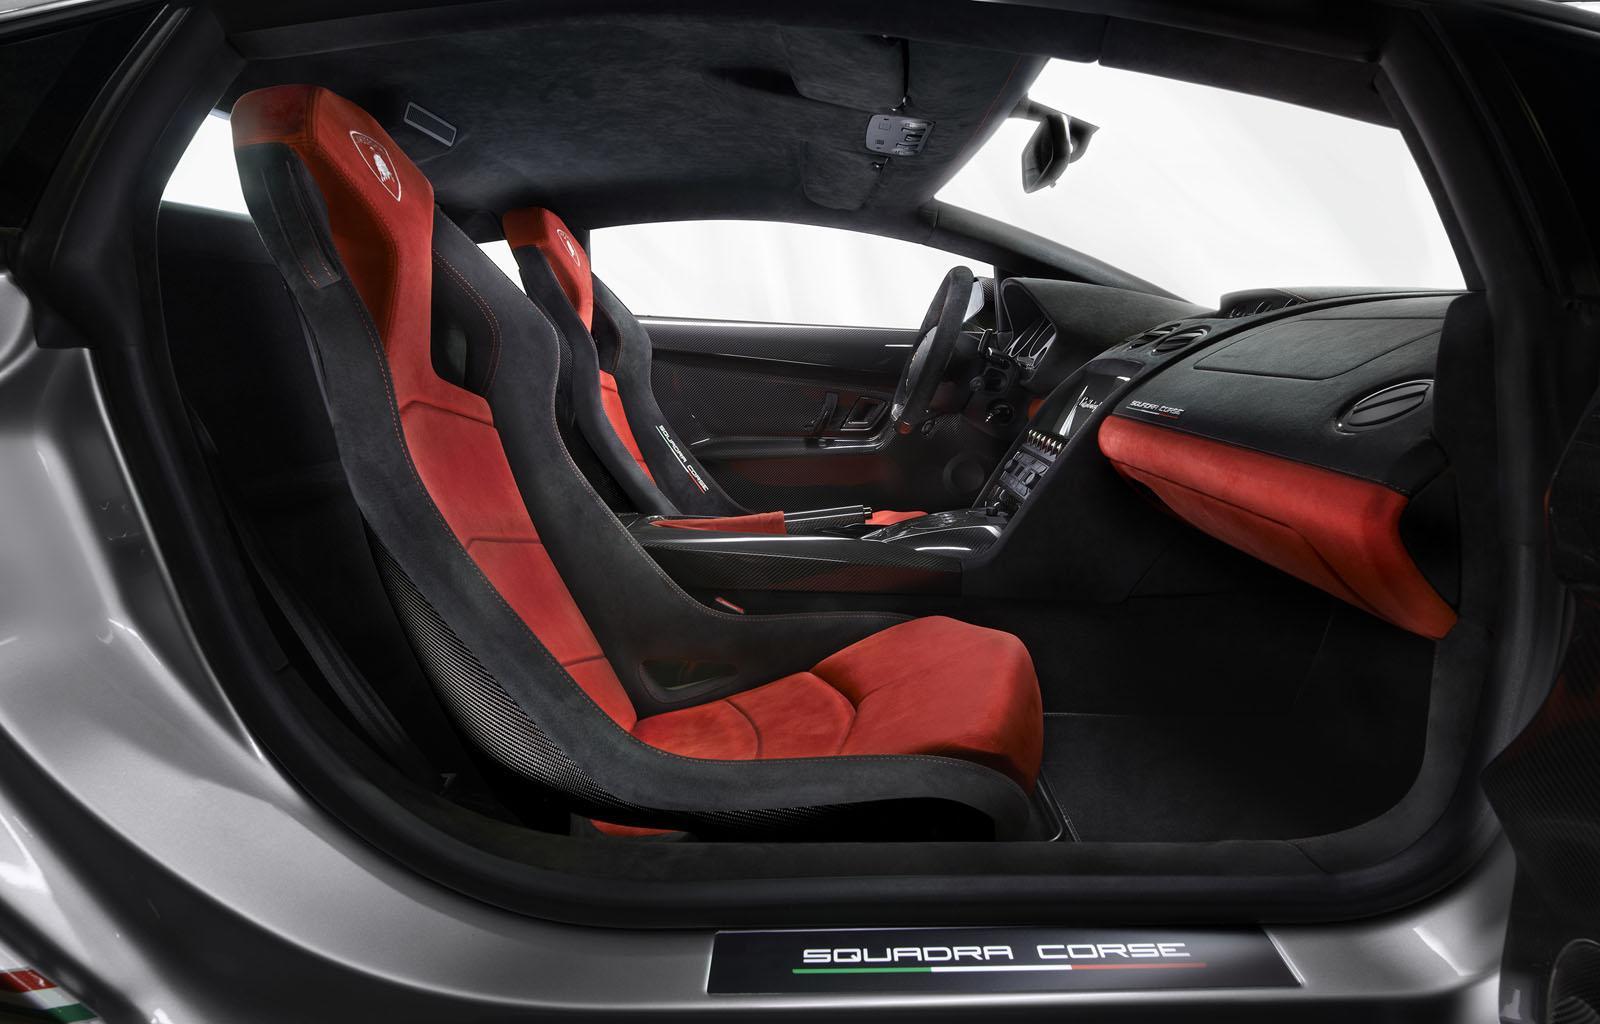 Lamborghini Gallardo Lp570 4 Squadra Corse Interior Seats Forcegt Com